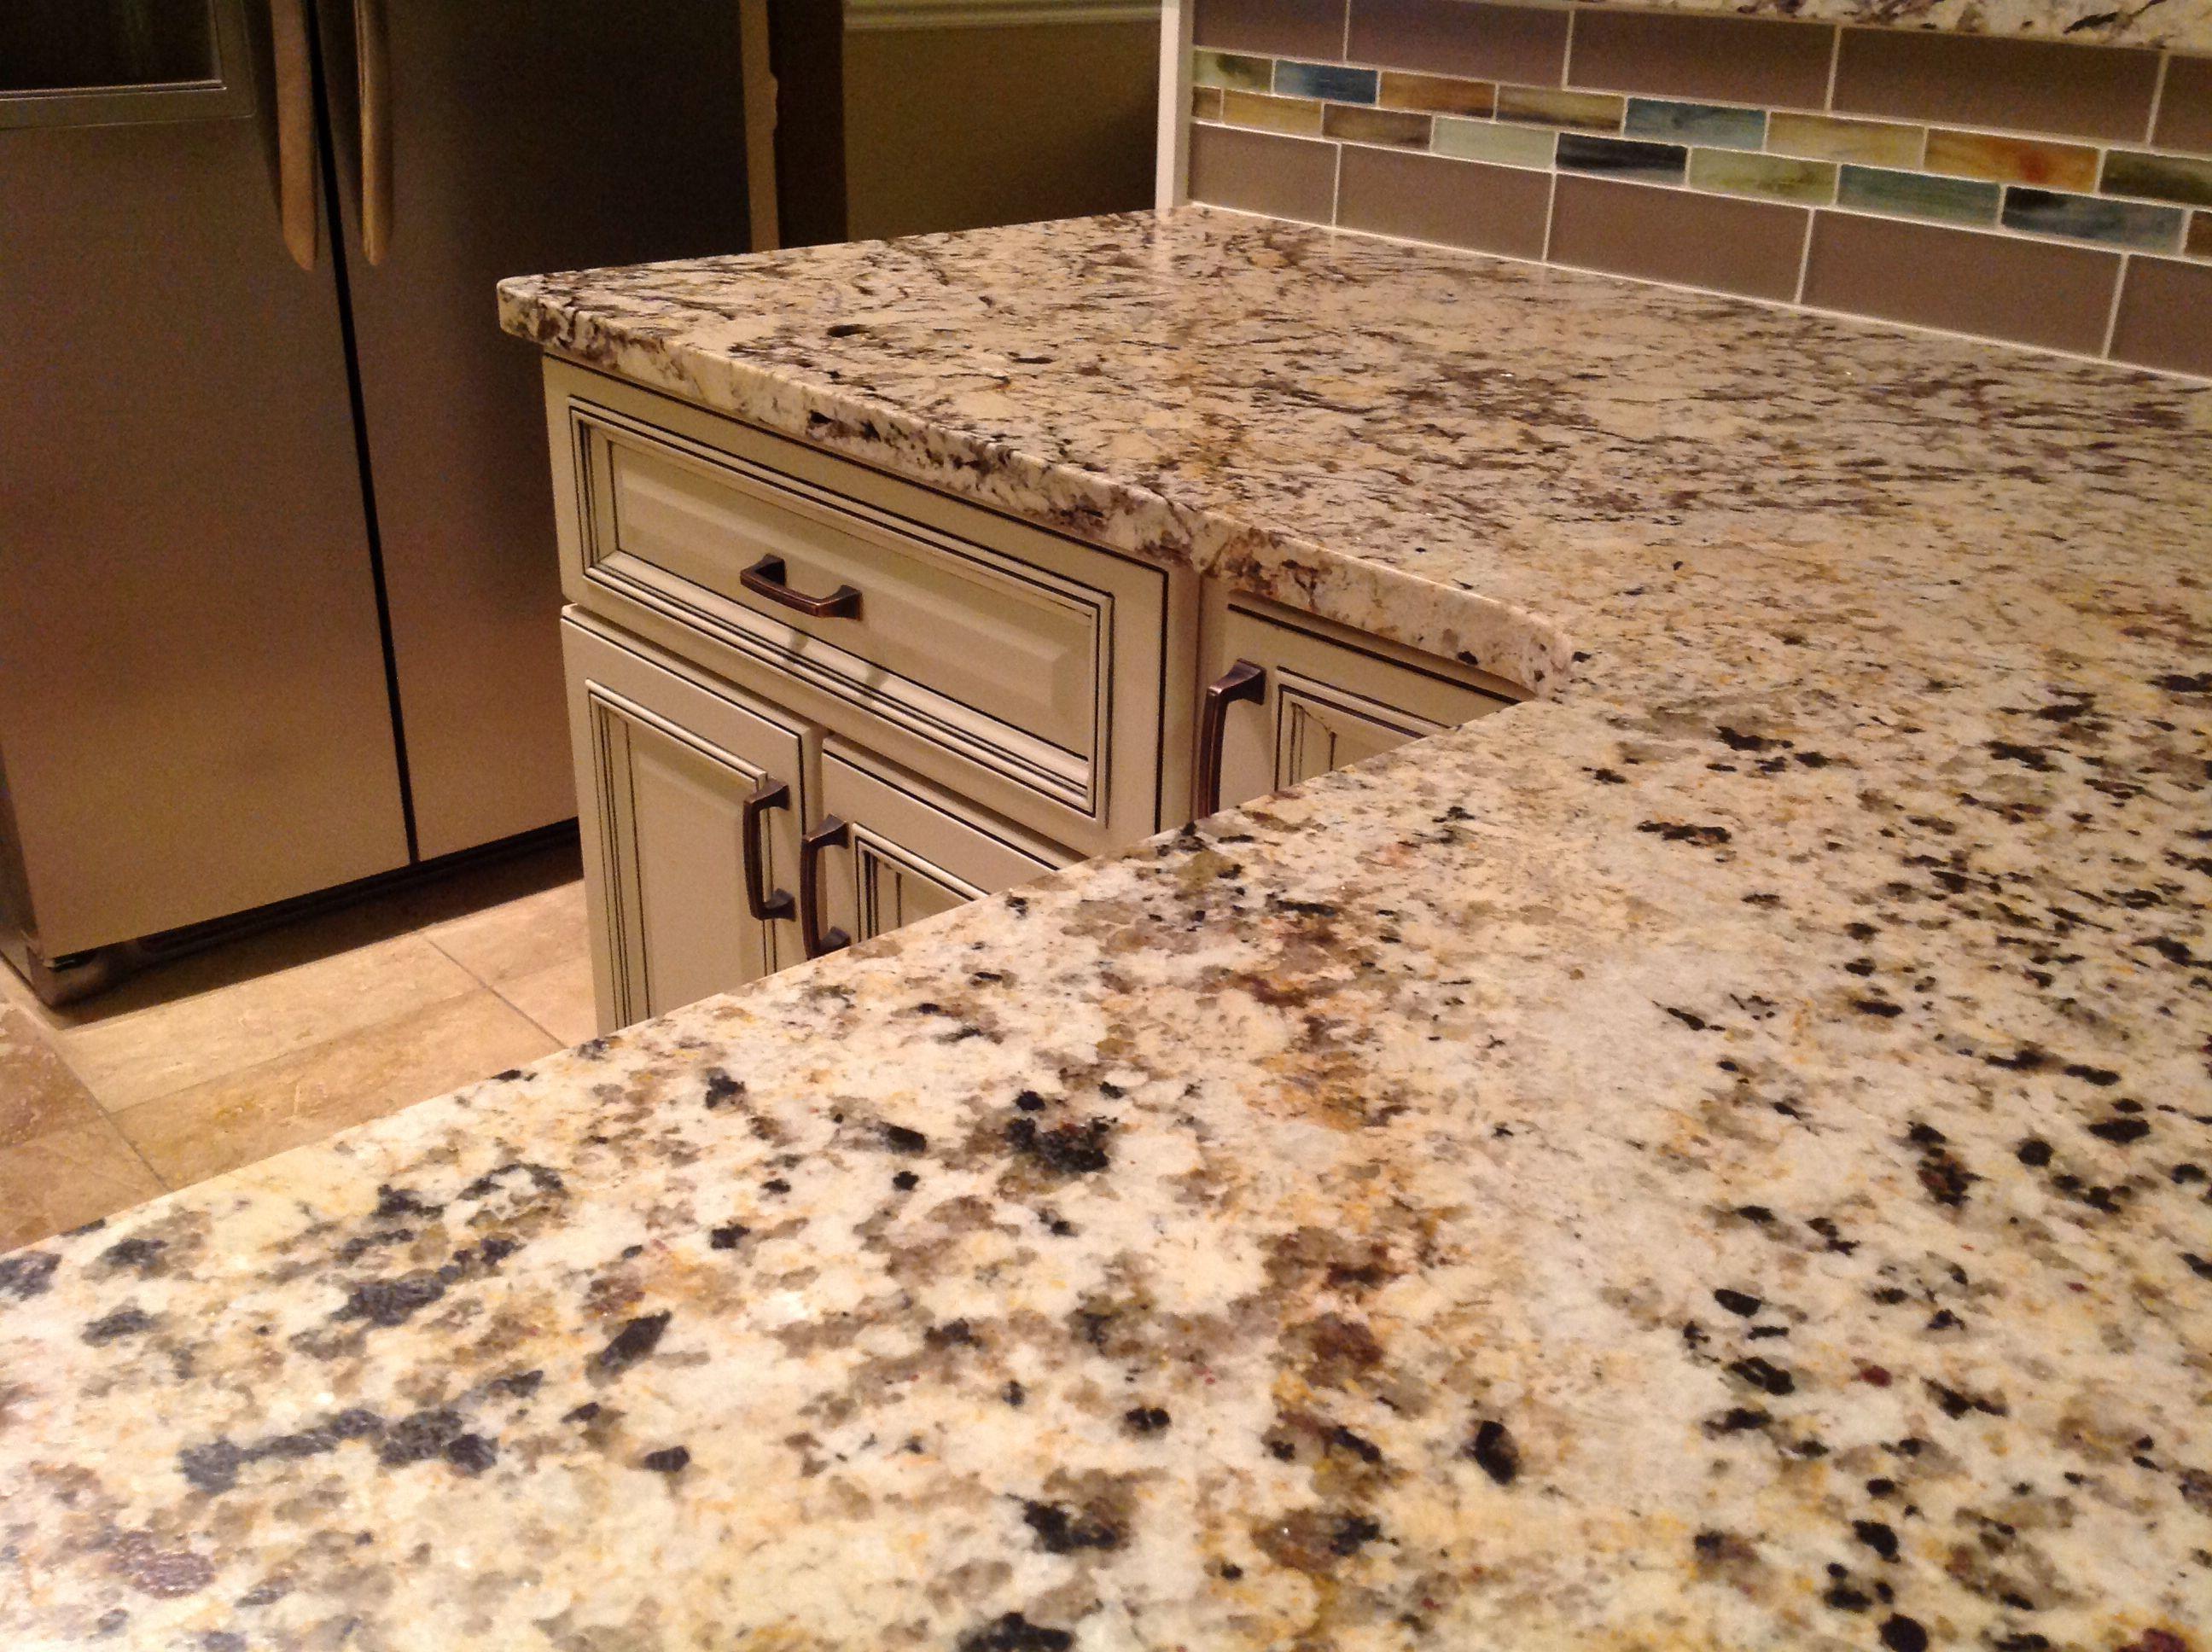 Caroline Summer Leather Finish Granite Love It Kitchen Remodel Kitchen Inspirations Kitchen Upgrades